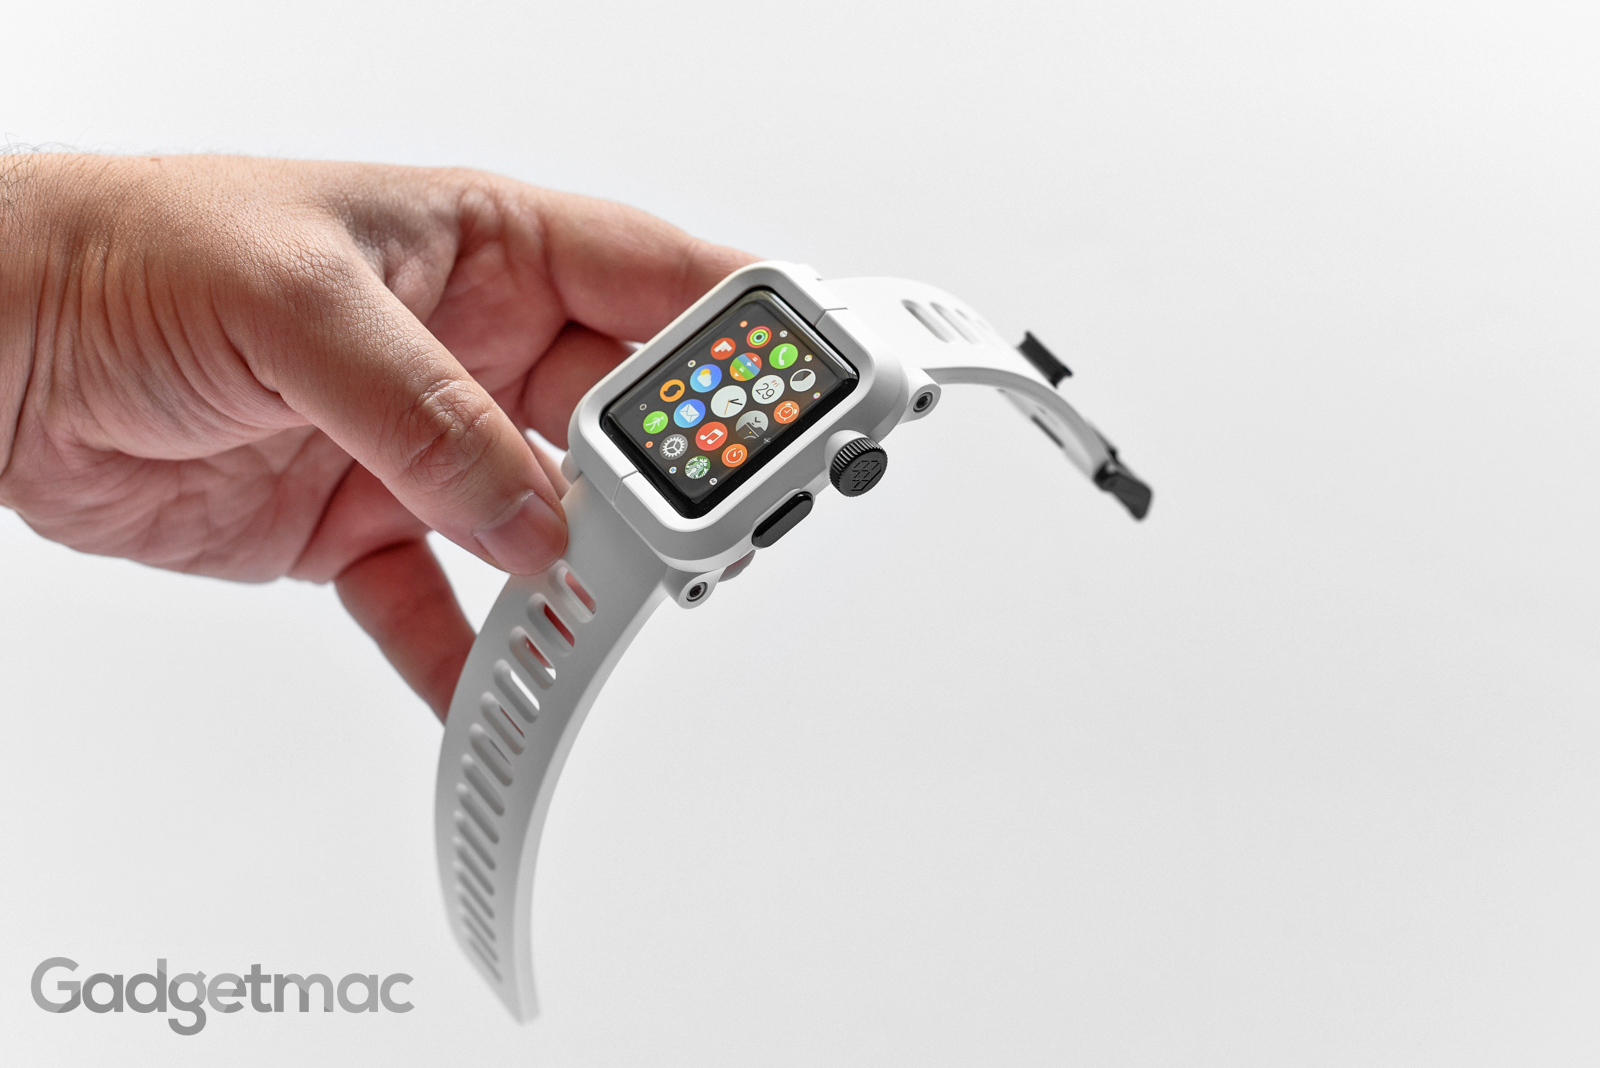 lunatik_epik_polycarbonate_white_apple_watch_case_with_band.jpg